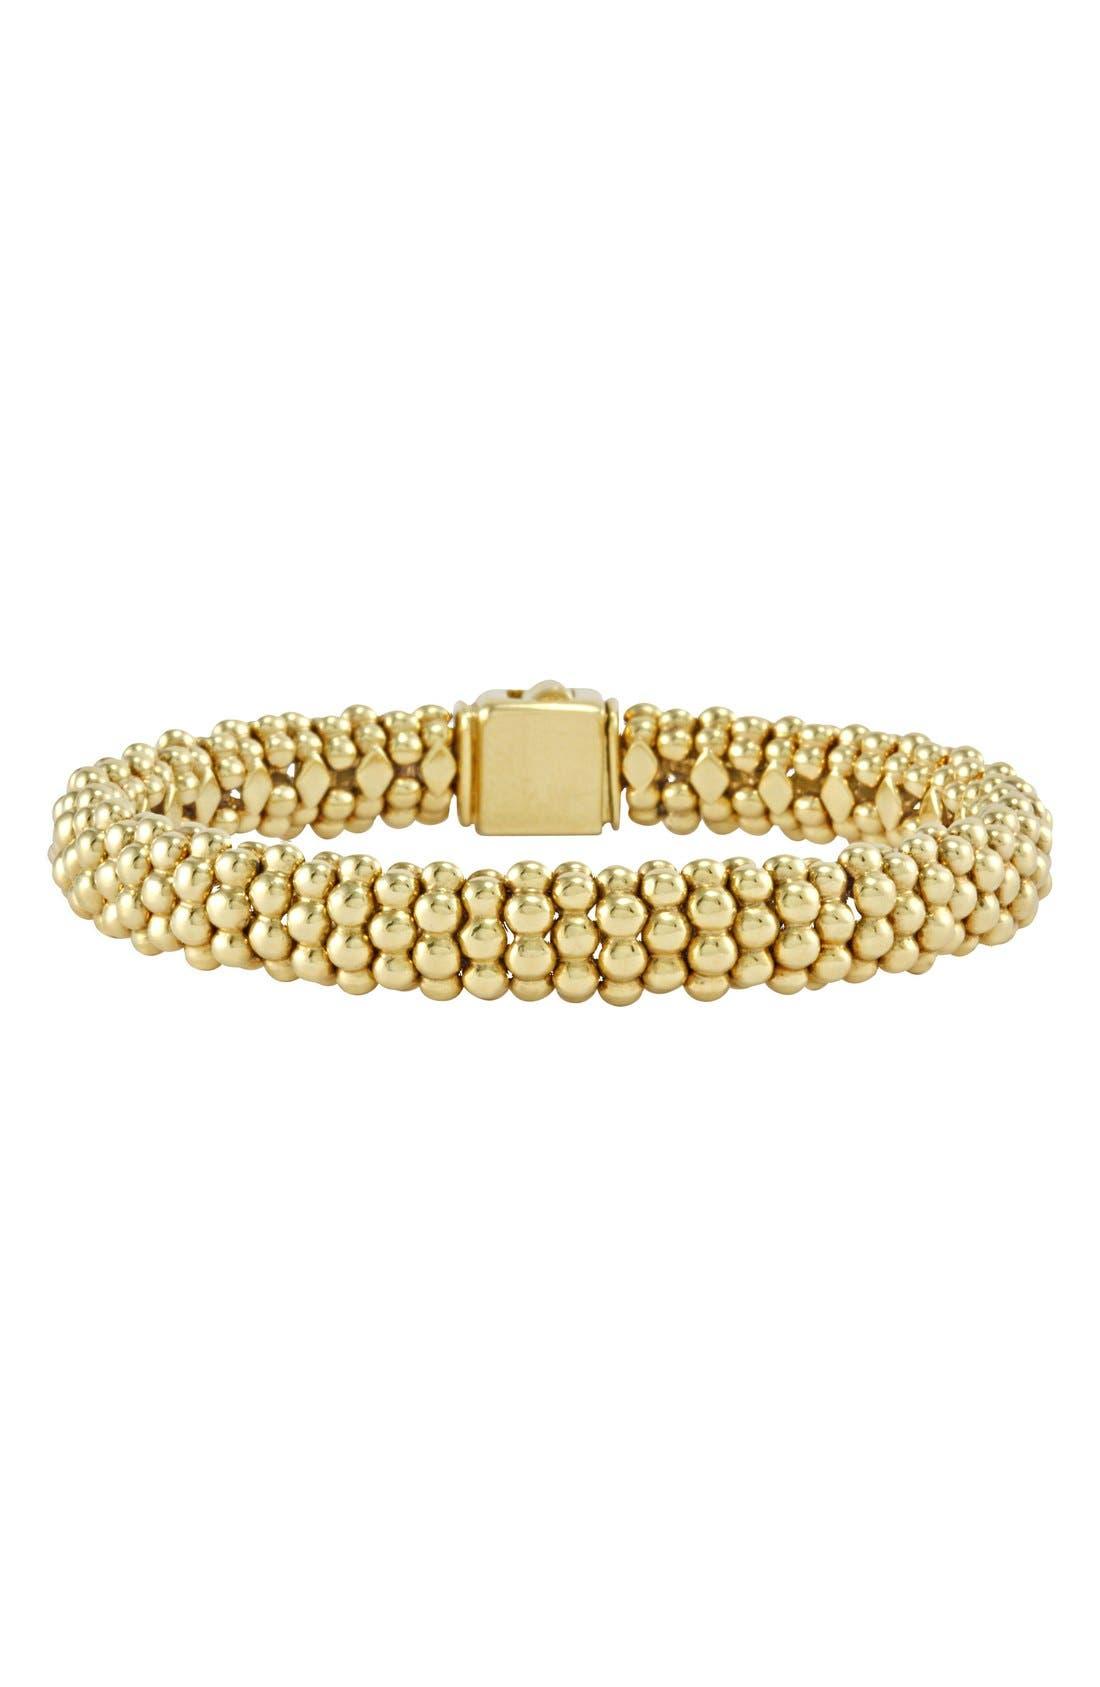 'Caviar Gold' Rope Bracelet,                             Main thumbnail 1, color,                             GOLD